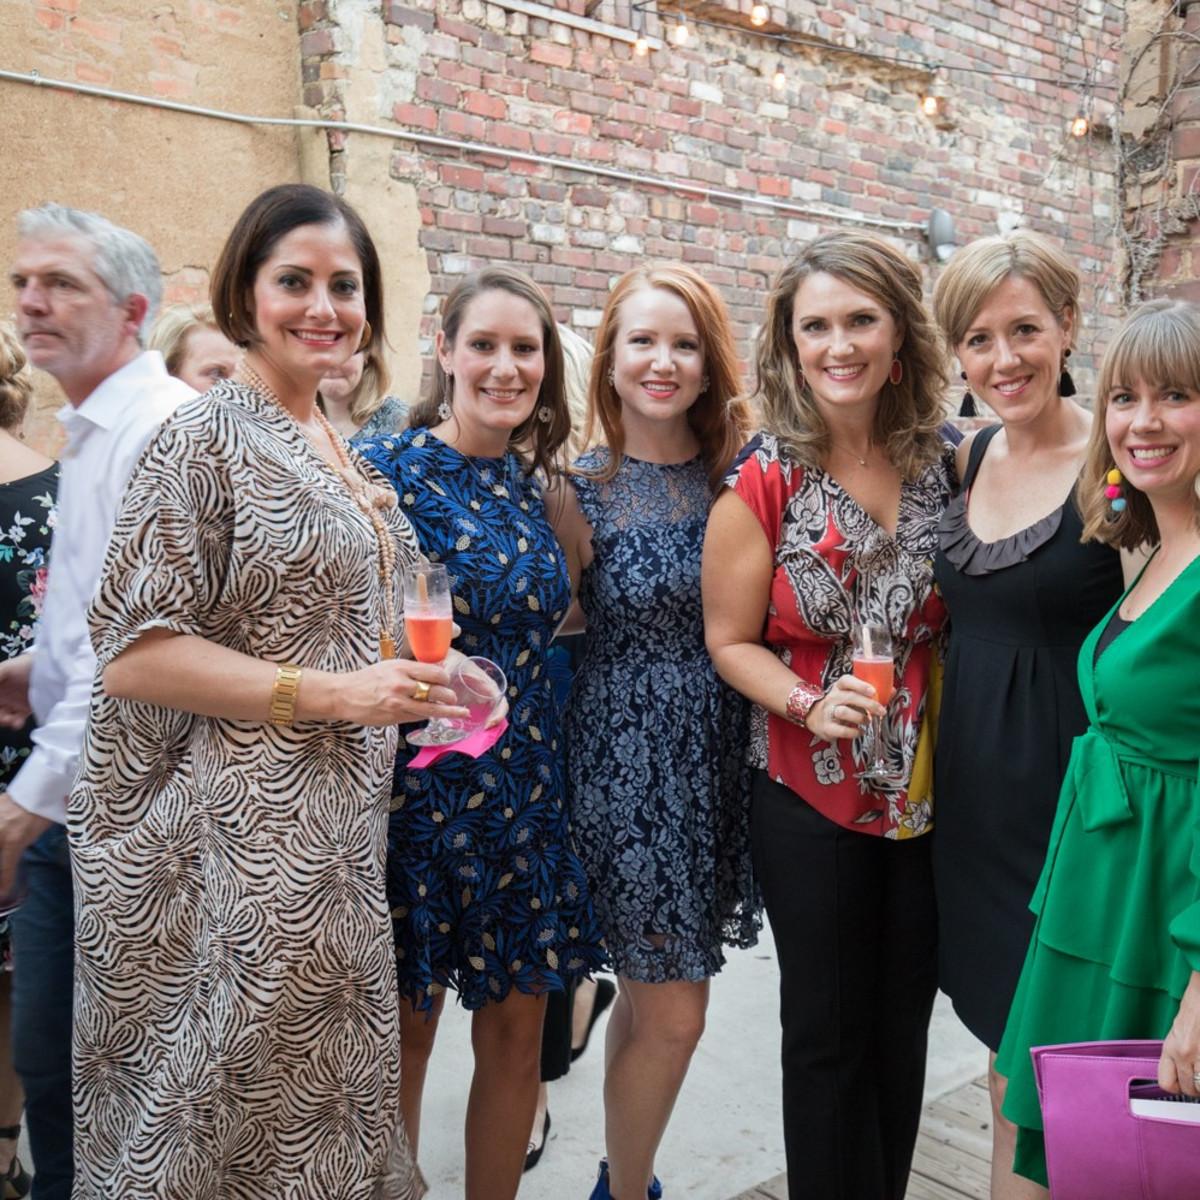 Megan Gee, Harriet Shields, Holli Davies, Laura Patton, Lindsay Klatzkin, Carley J Moore